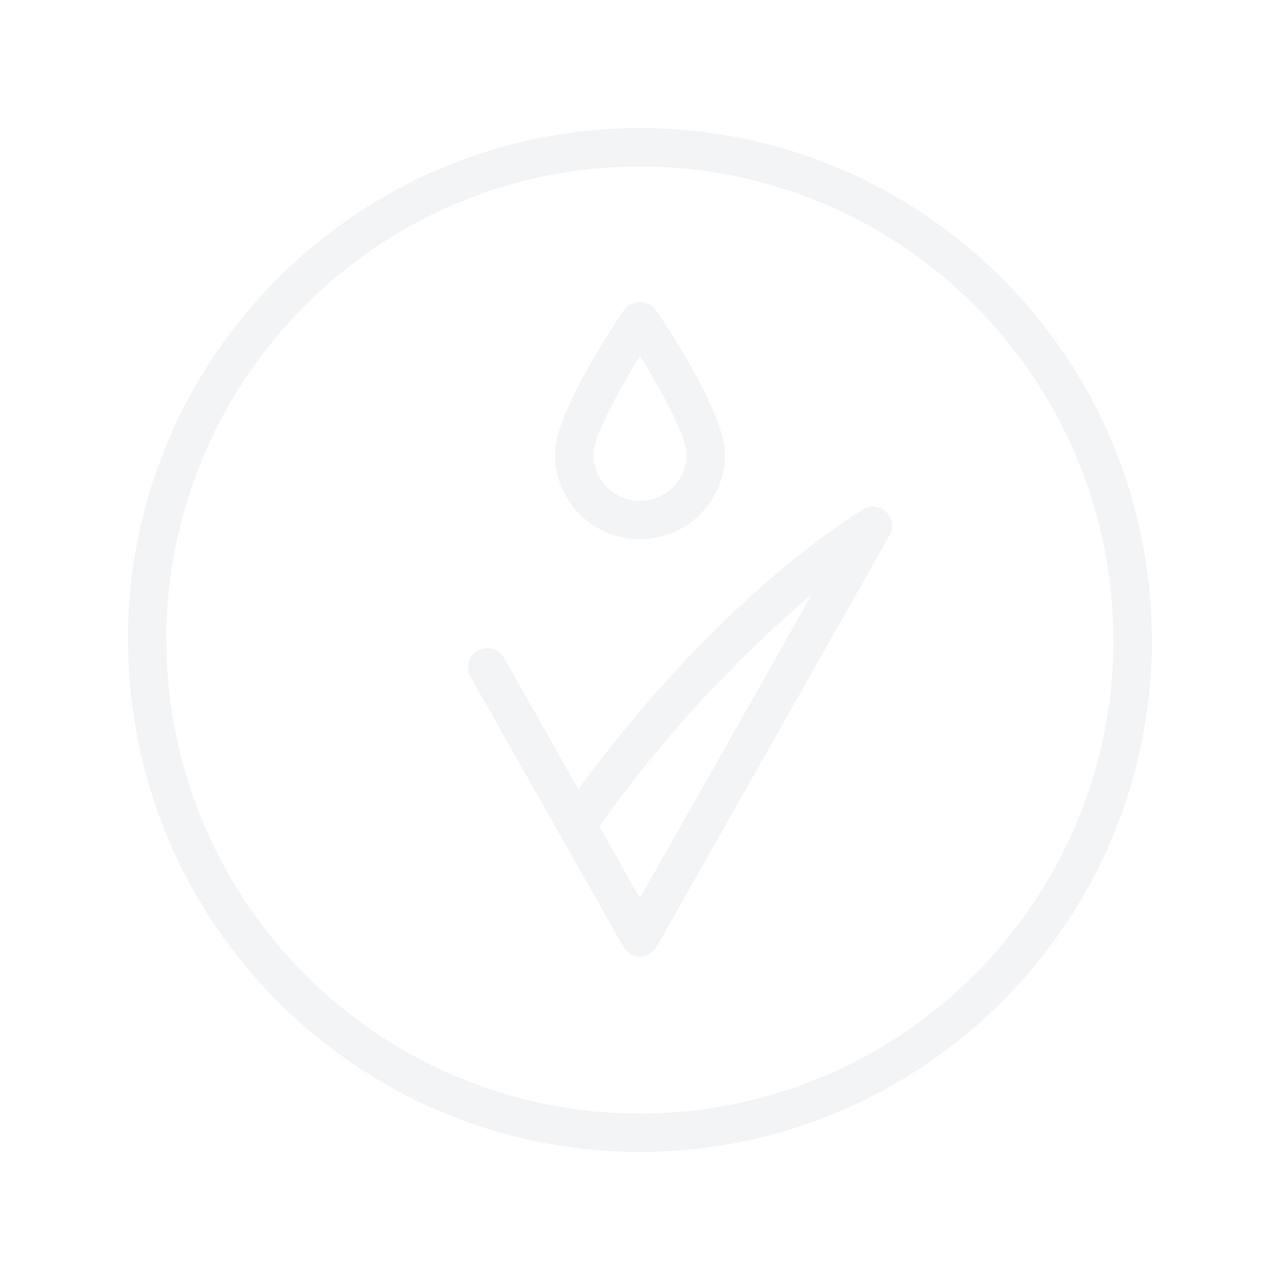 MISSHA Lighting Tone Up Violet Base 20ml